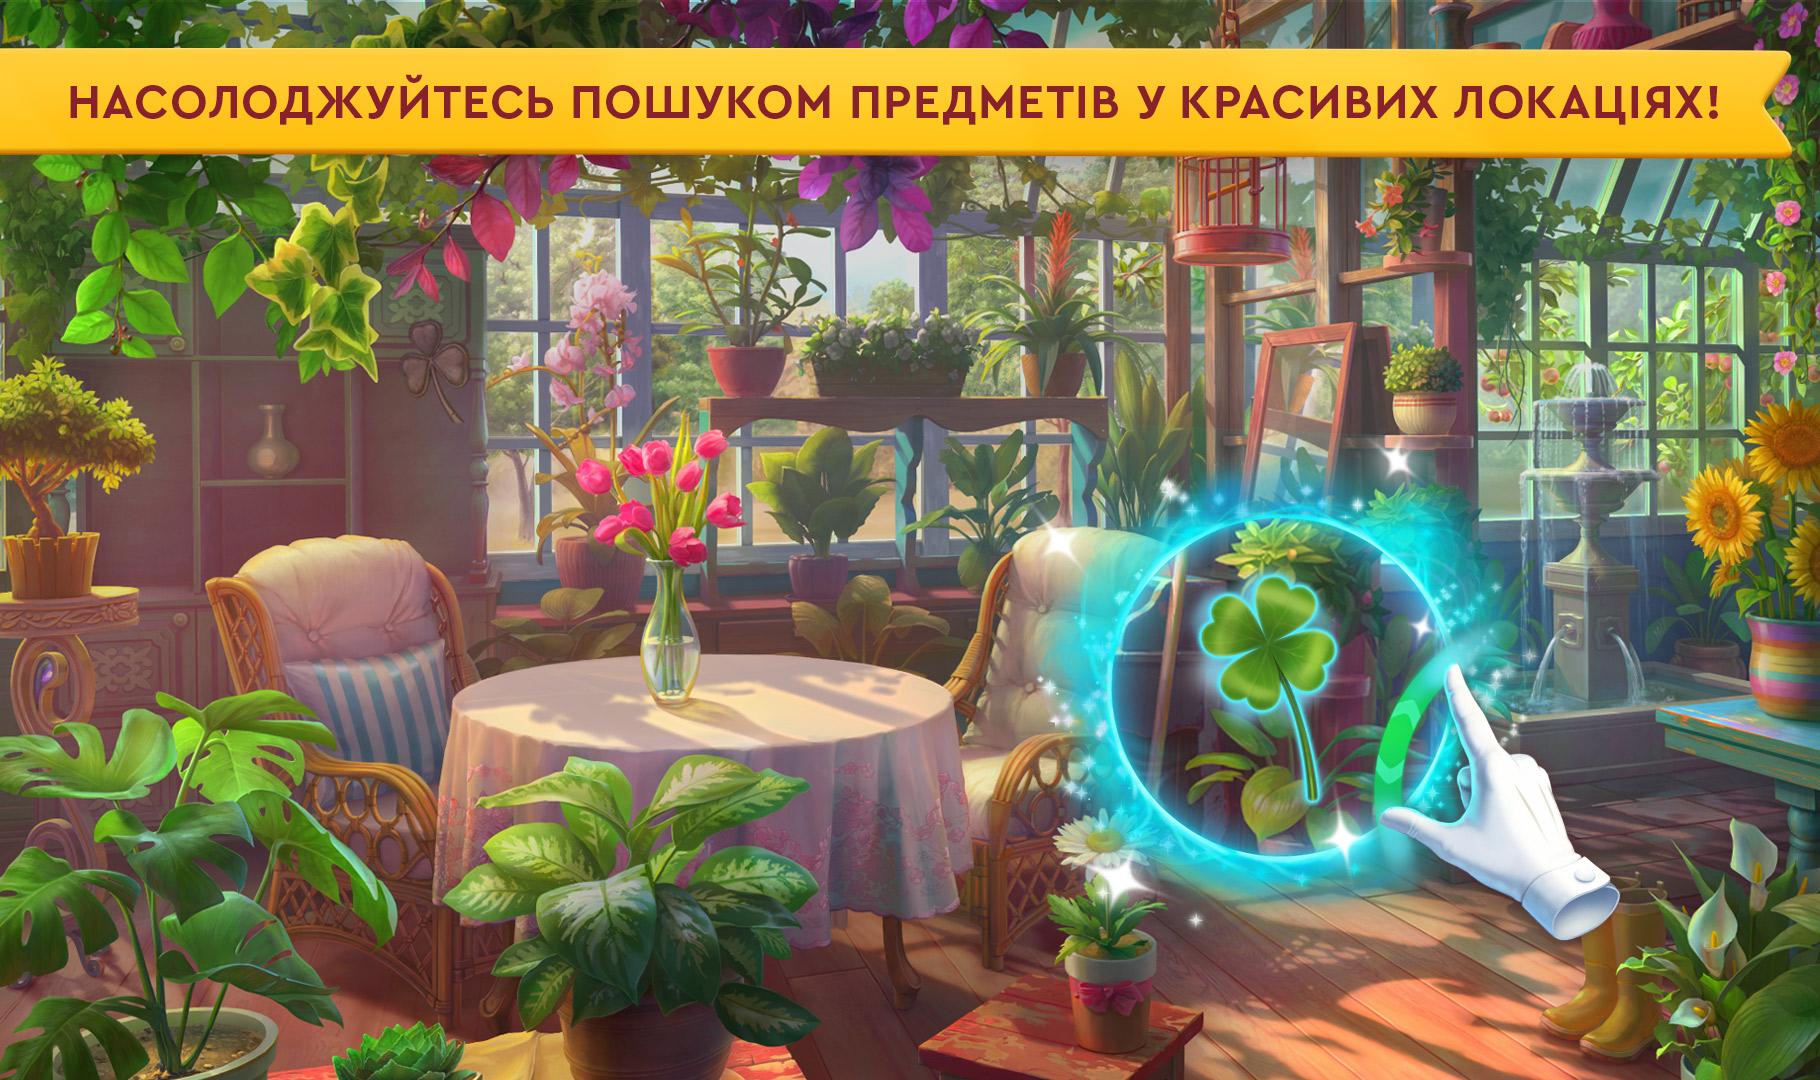 Post_4_ukr